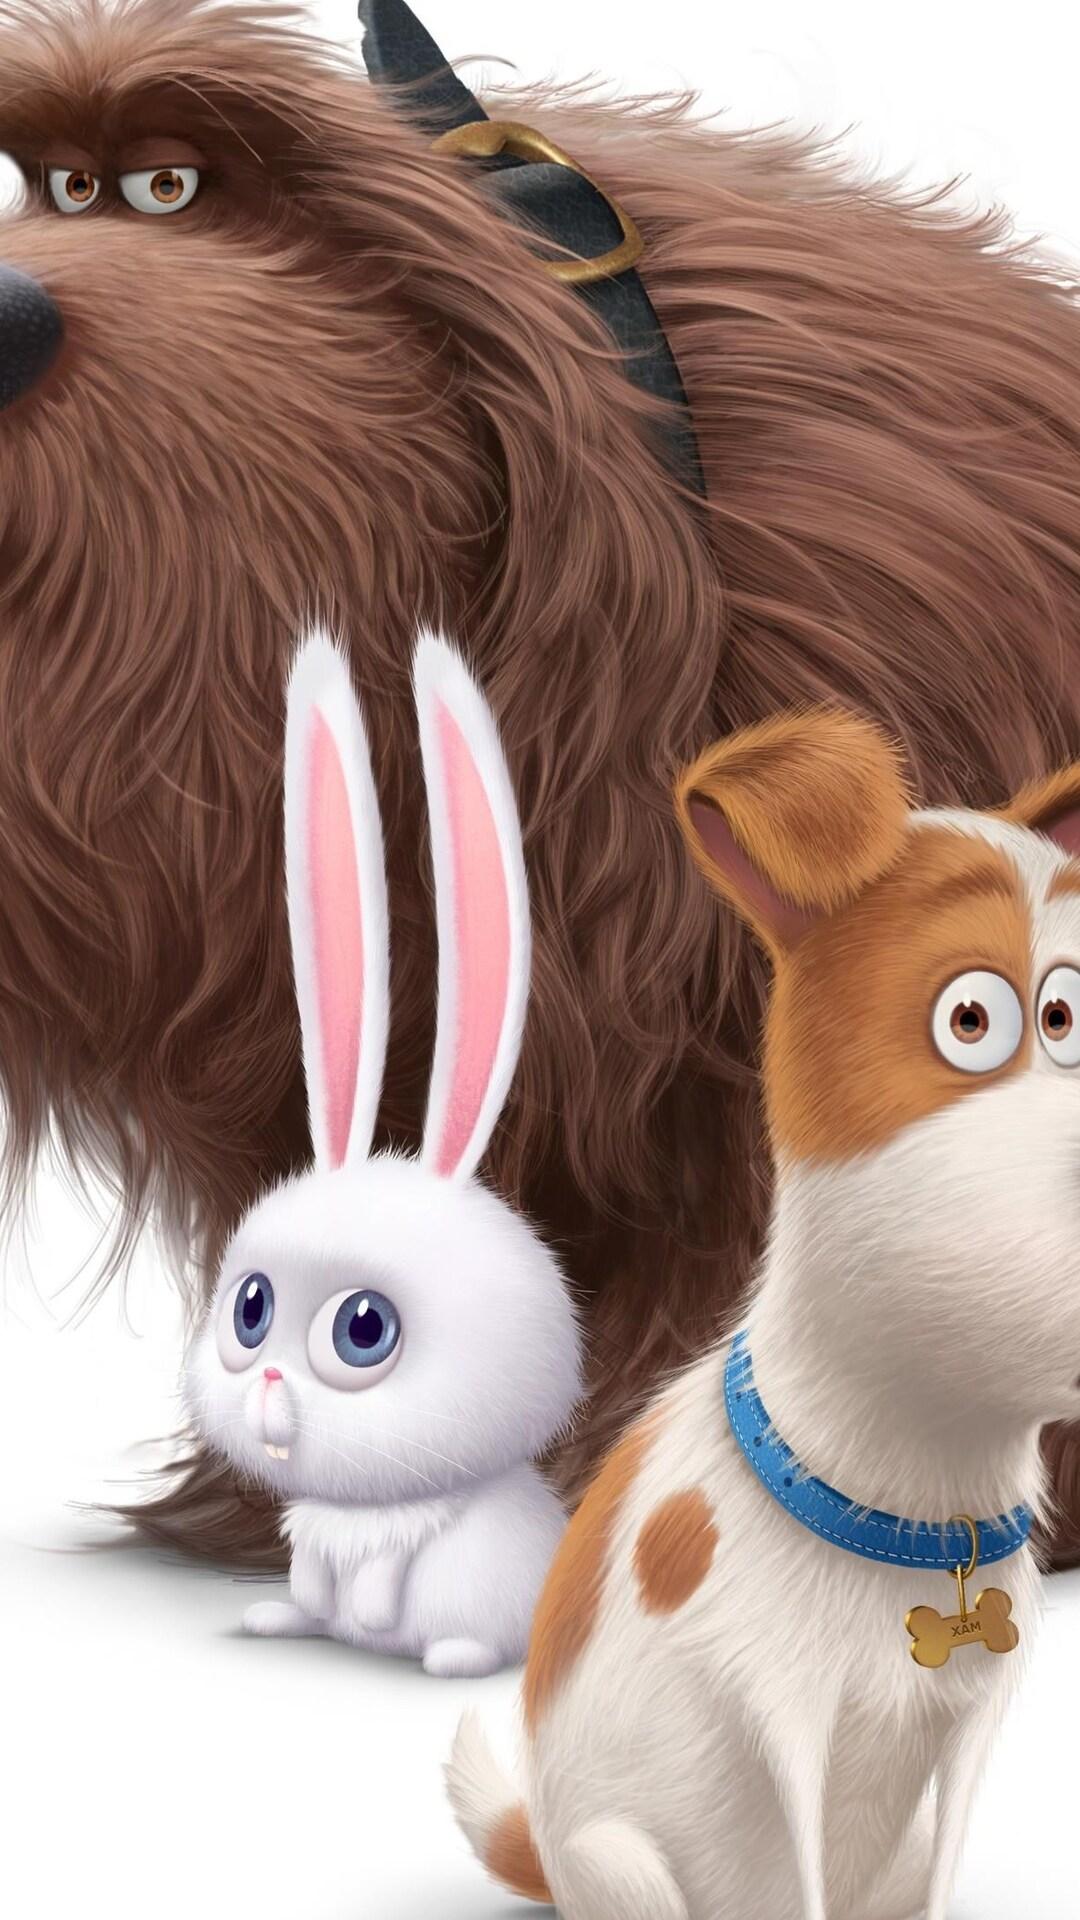 the-secrete-life-of-pets-movie-dogs.jpg